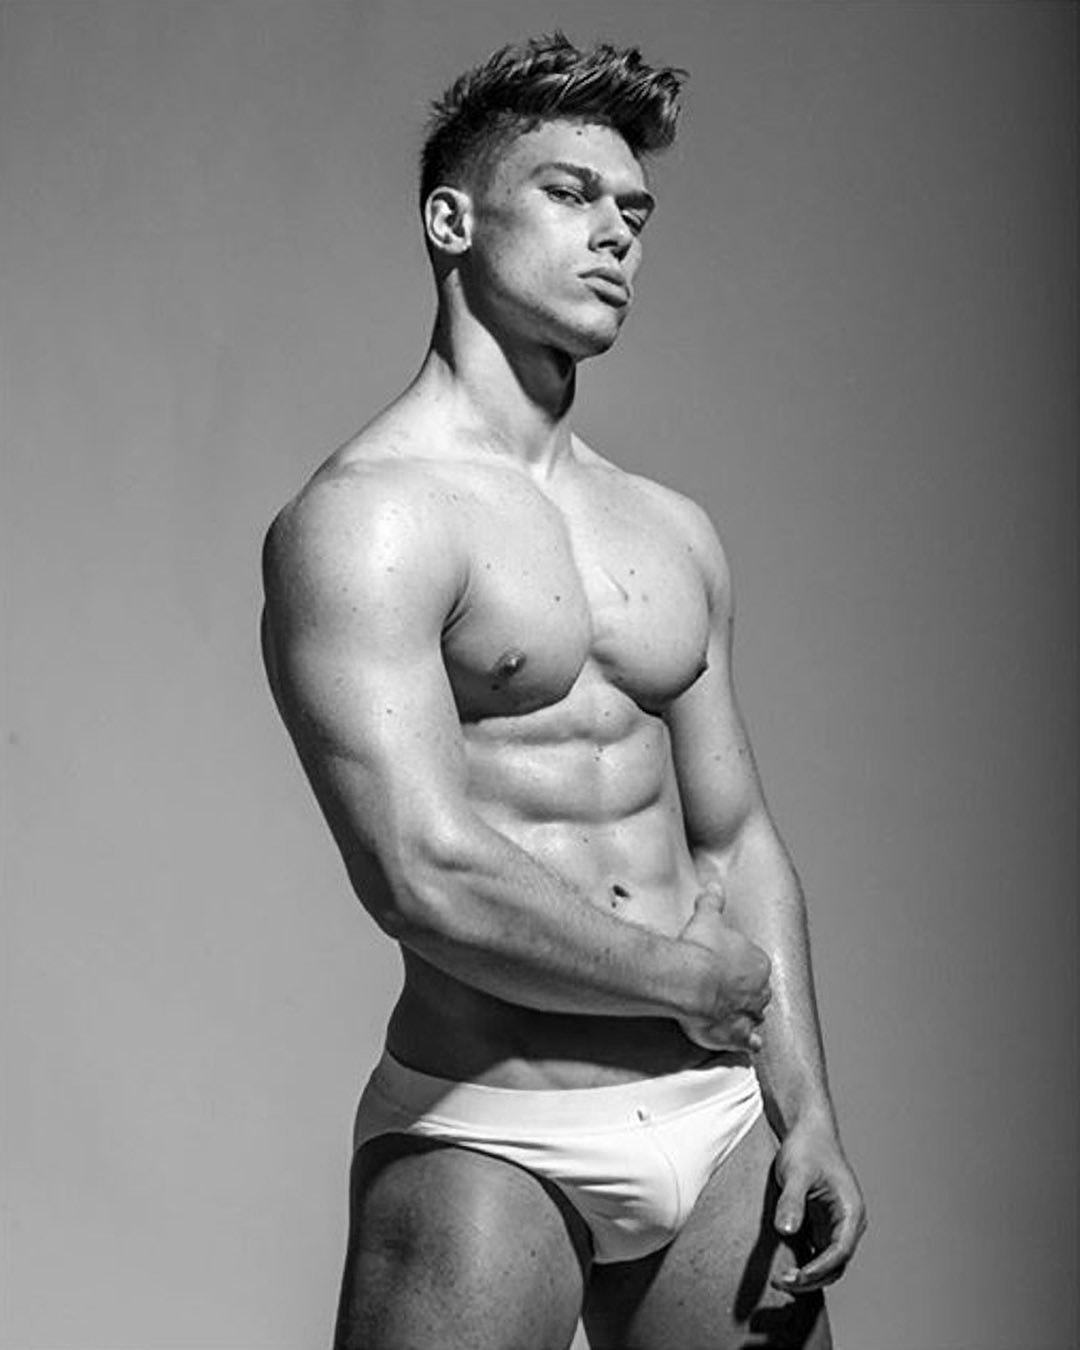 #men #blackandwhite #bulge #briefs #muscle #twinks #hotmen #hotboys